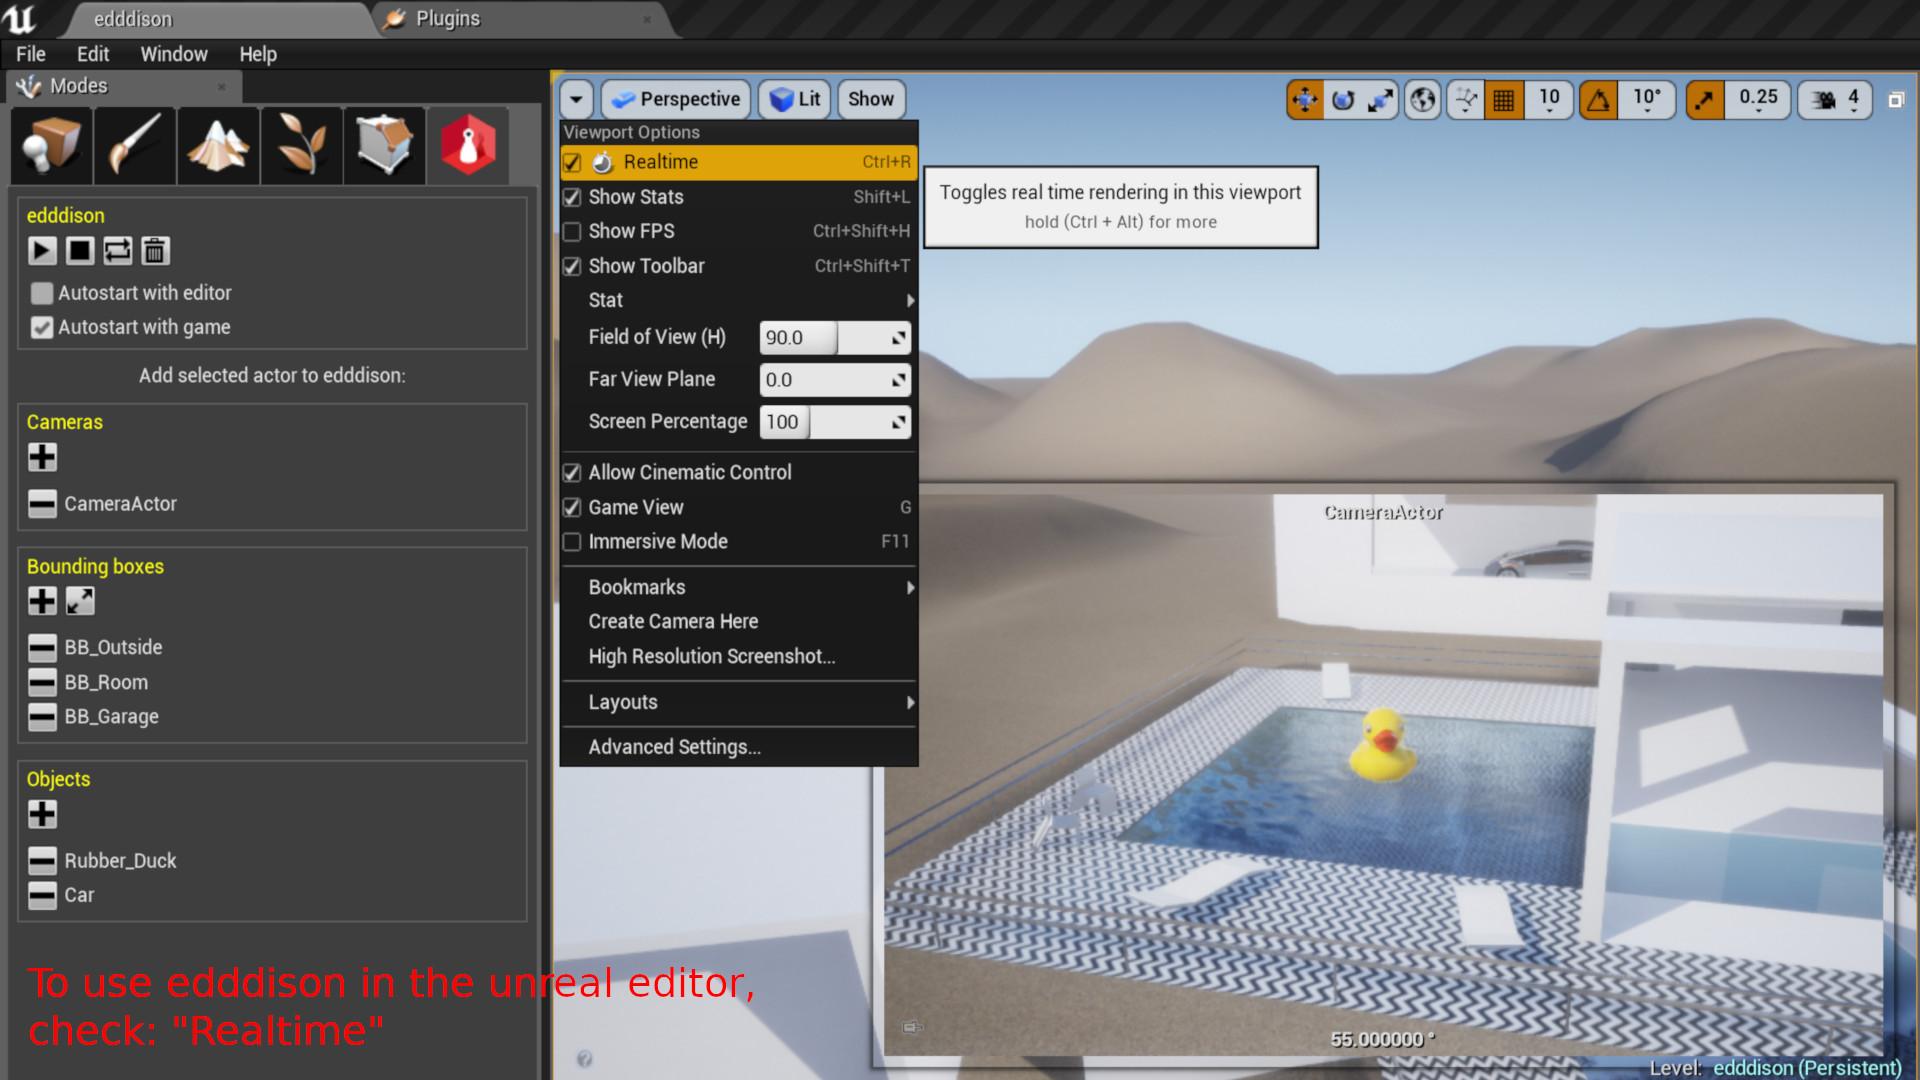 edddison - create interactive 3D presentations by edddison